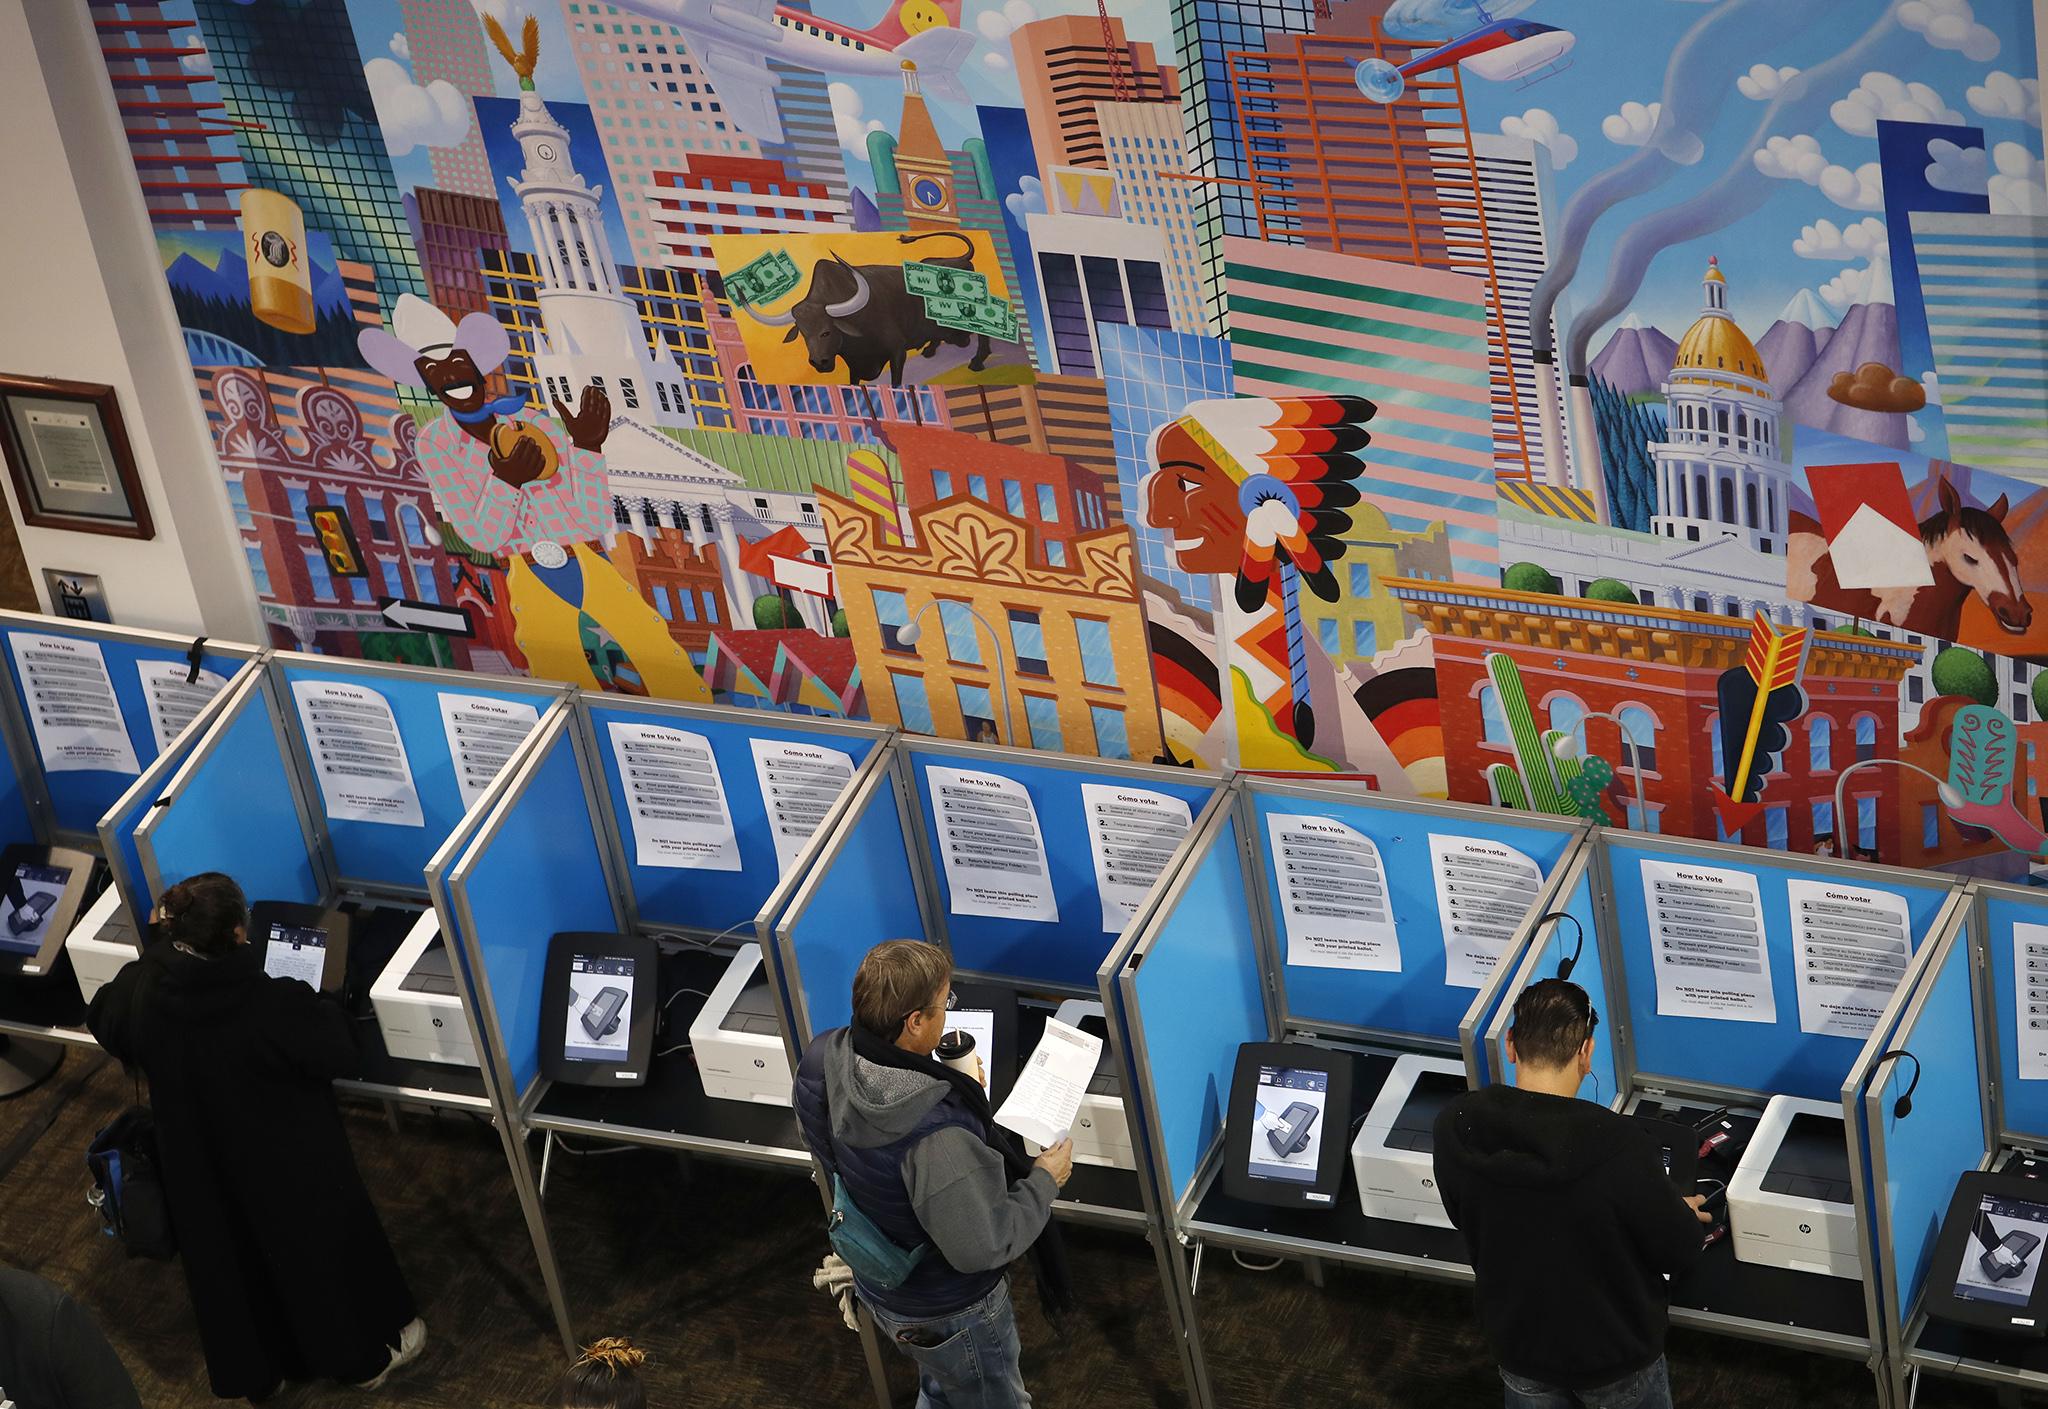 Colorado Democrats Want To Make Voter Registration So